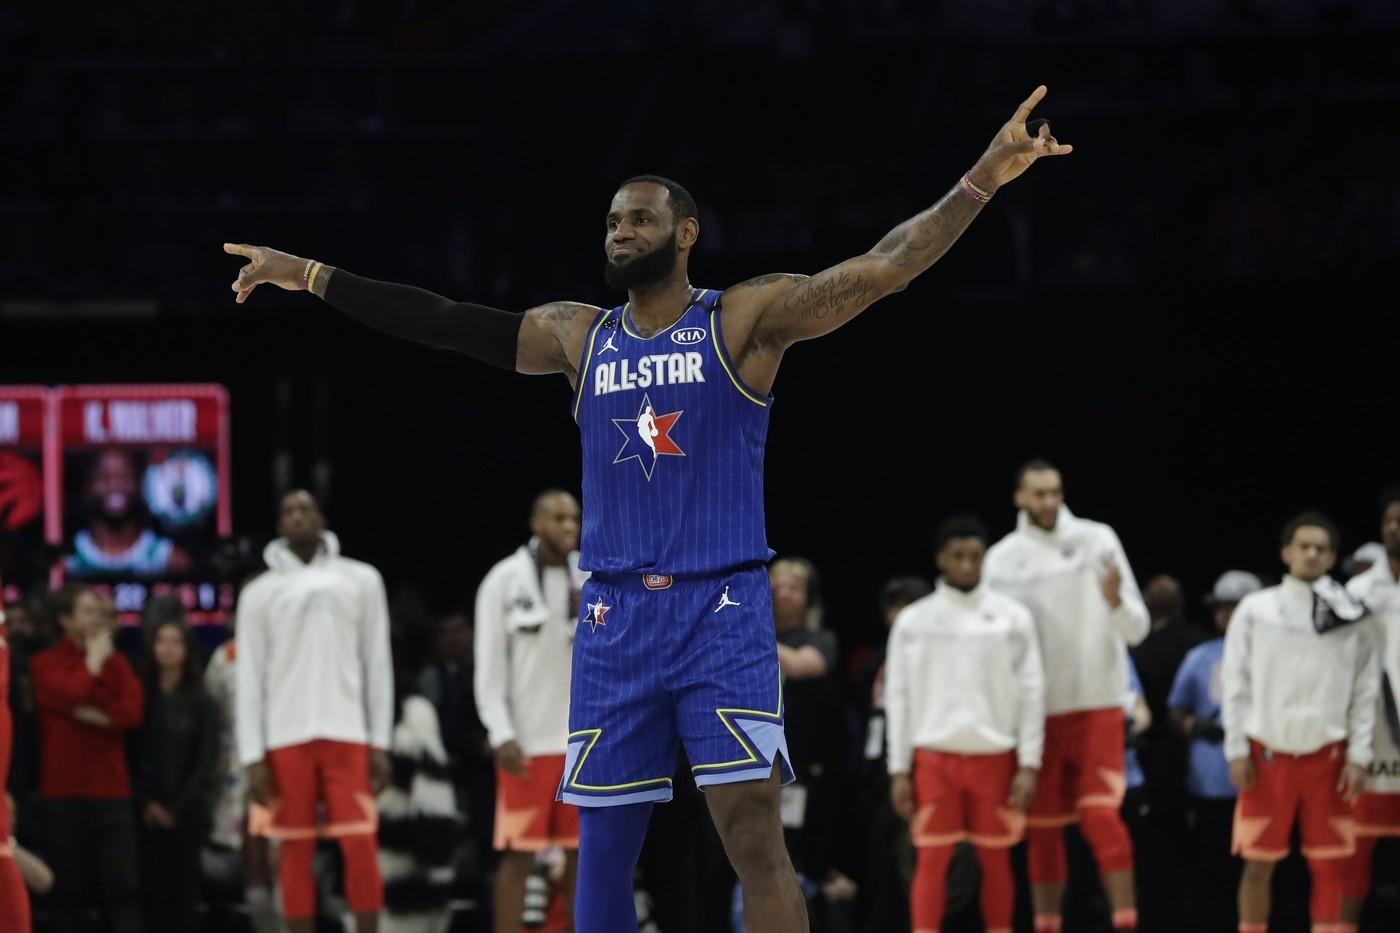 Nba: team LeBron rimonta e vince l'All Star Game. Mvp a Kawhi Leonard